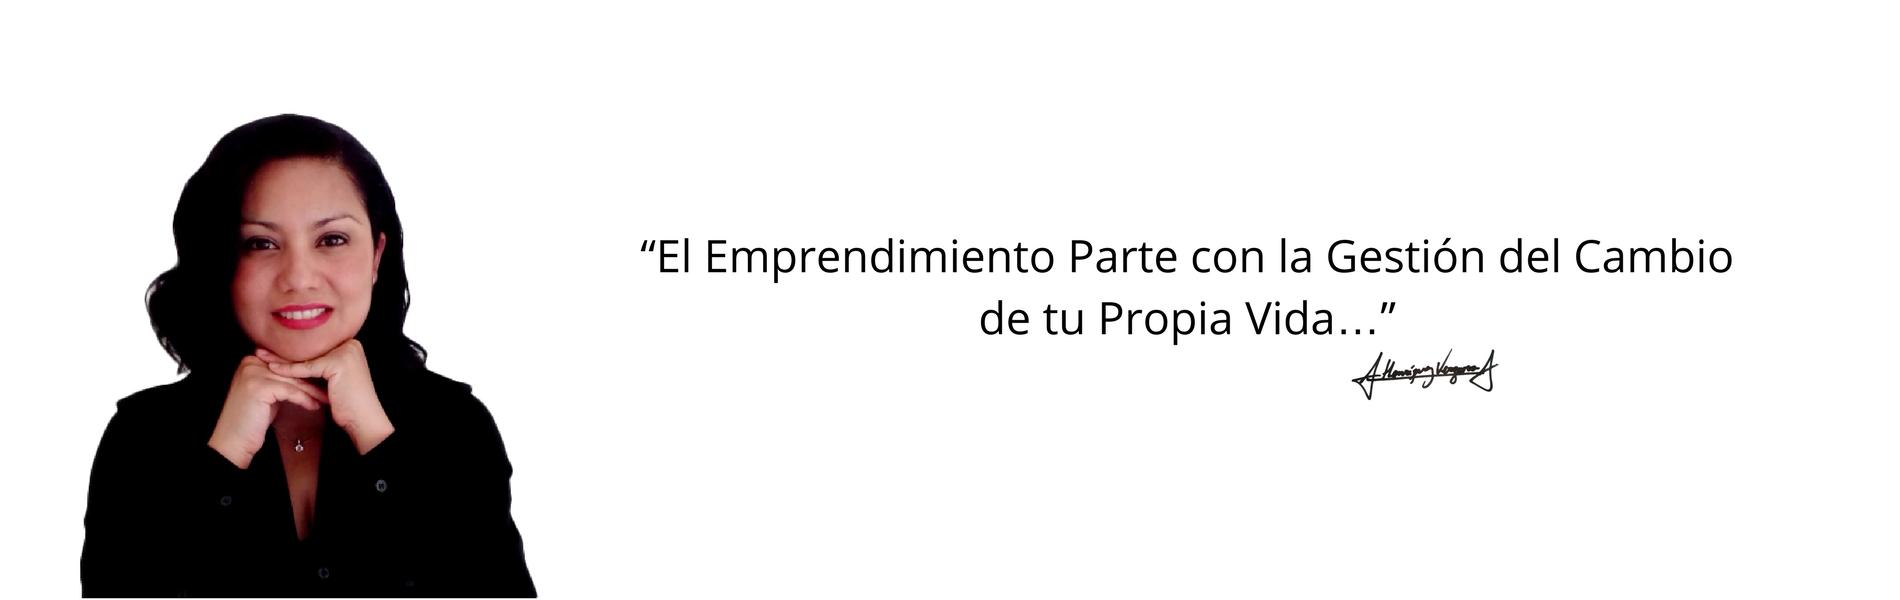 Andrea Henriquez Vergara